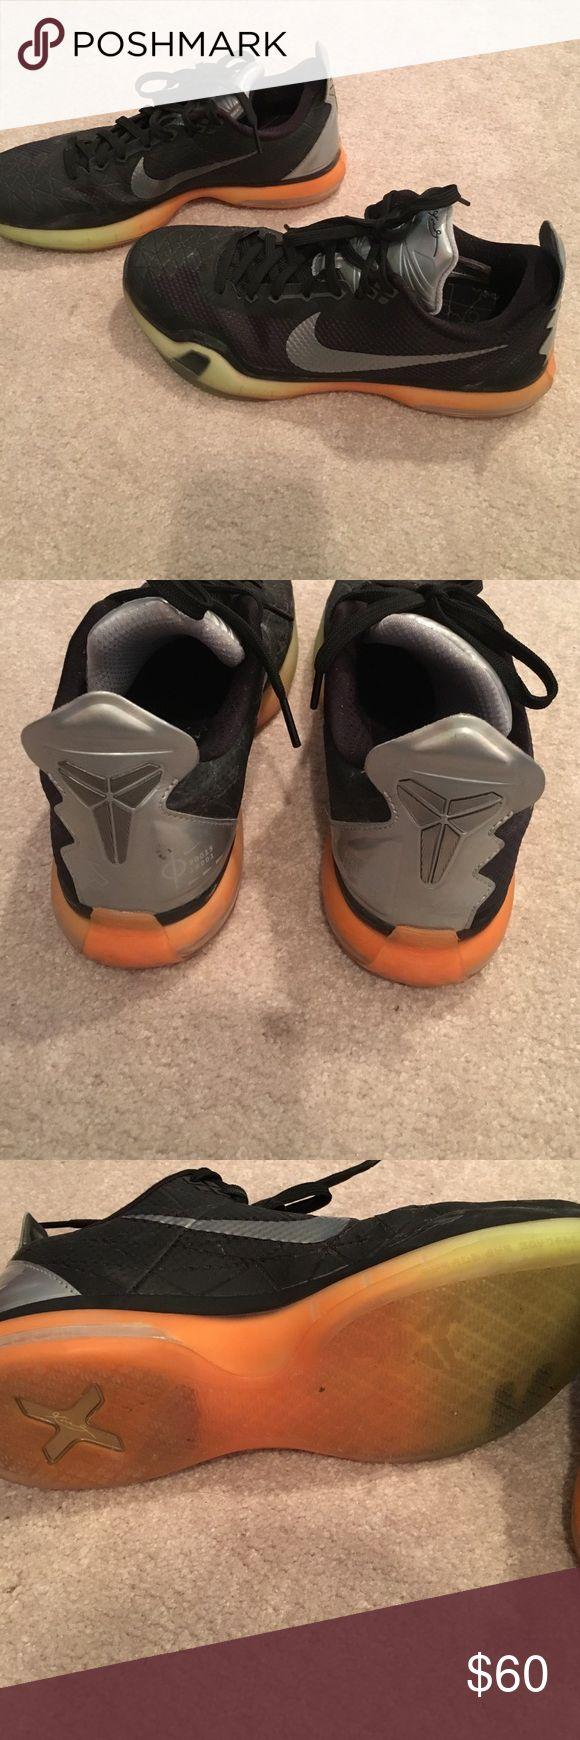 Men's Nike Kobe sneakers Good condition Nike Shoes Sneakers